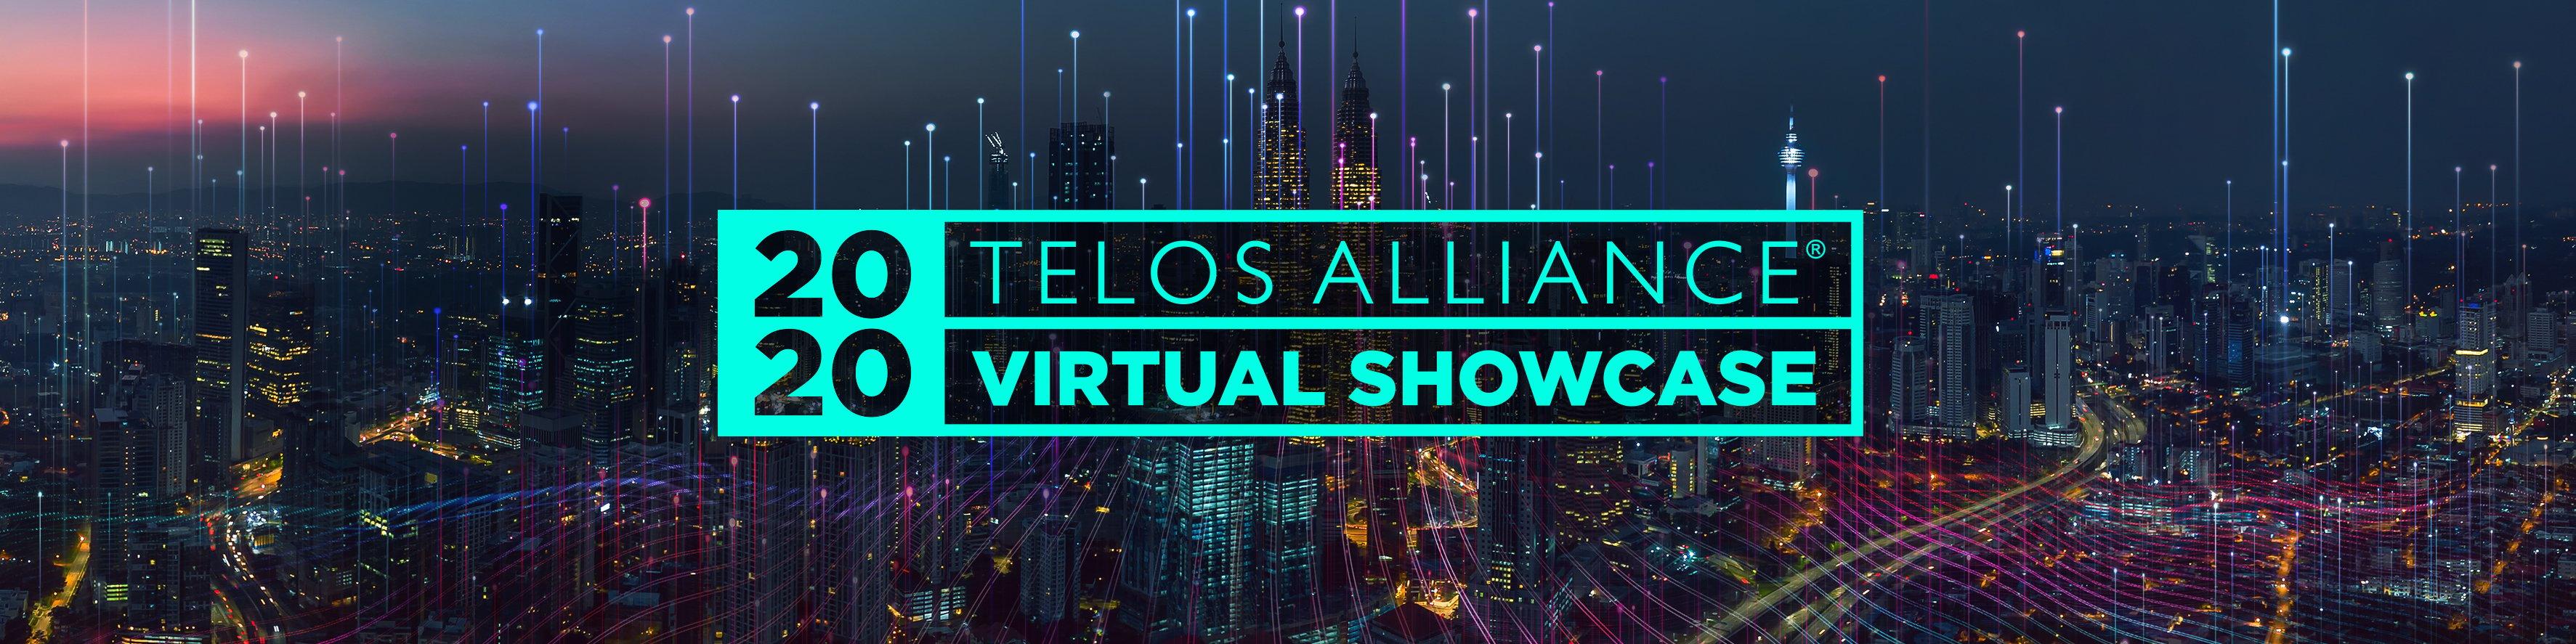 TA_Virtual Showcase_Landing Page_Revised